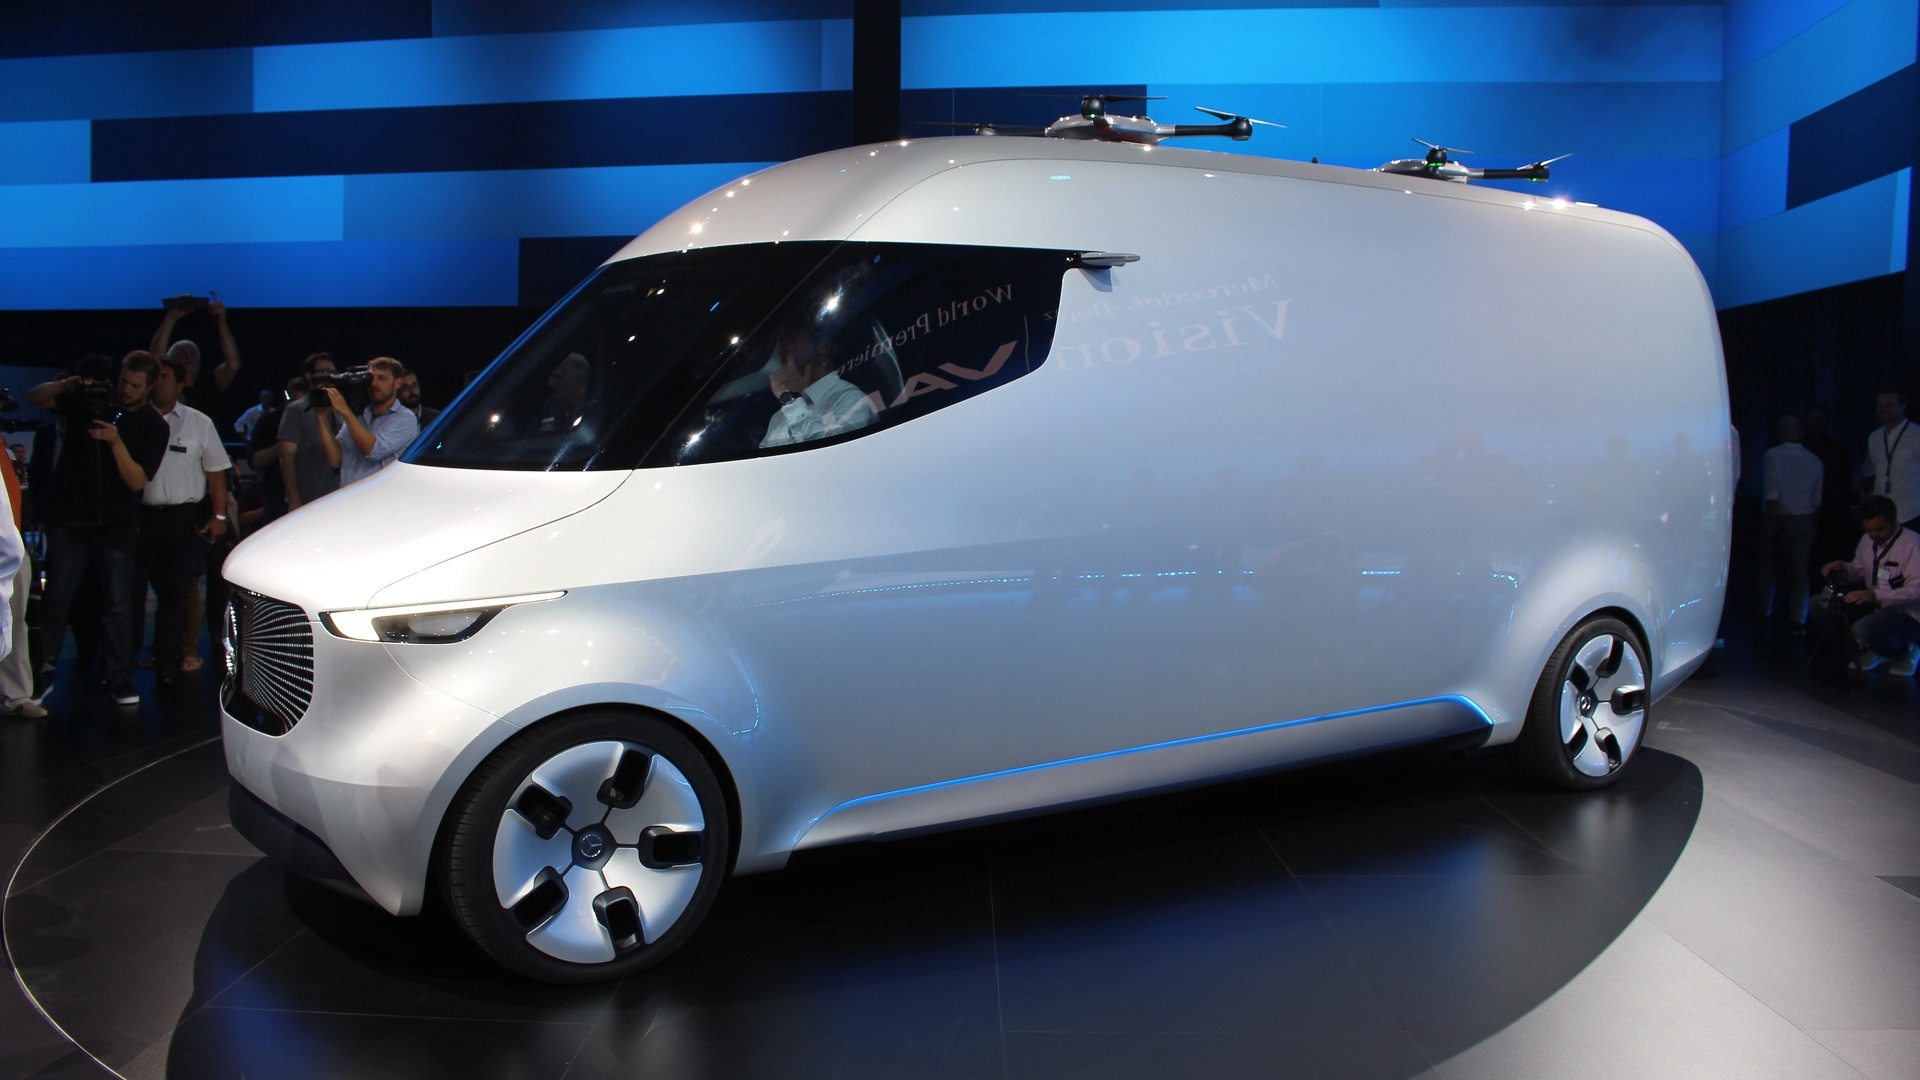 Mercedes Benz Commercial Van >> Mercedes Vision Van concept marks renewed focus on commercial vehicles